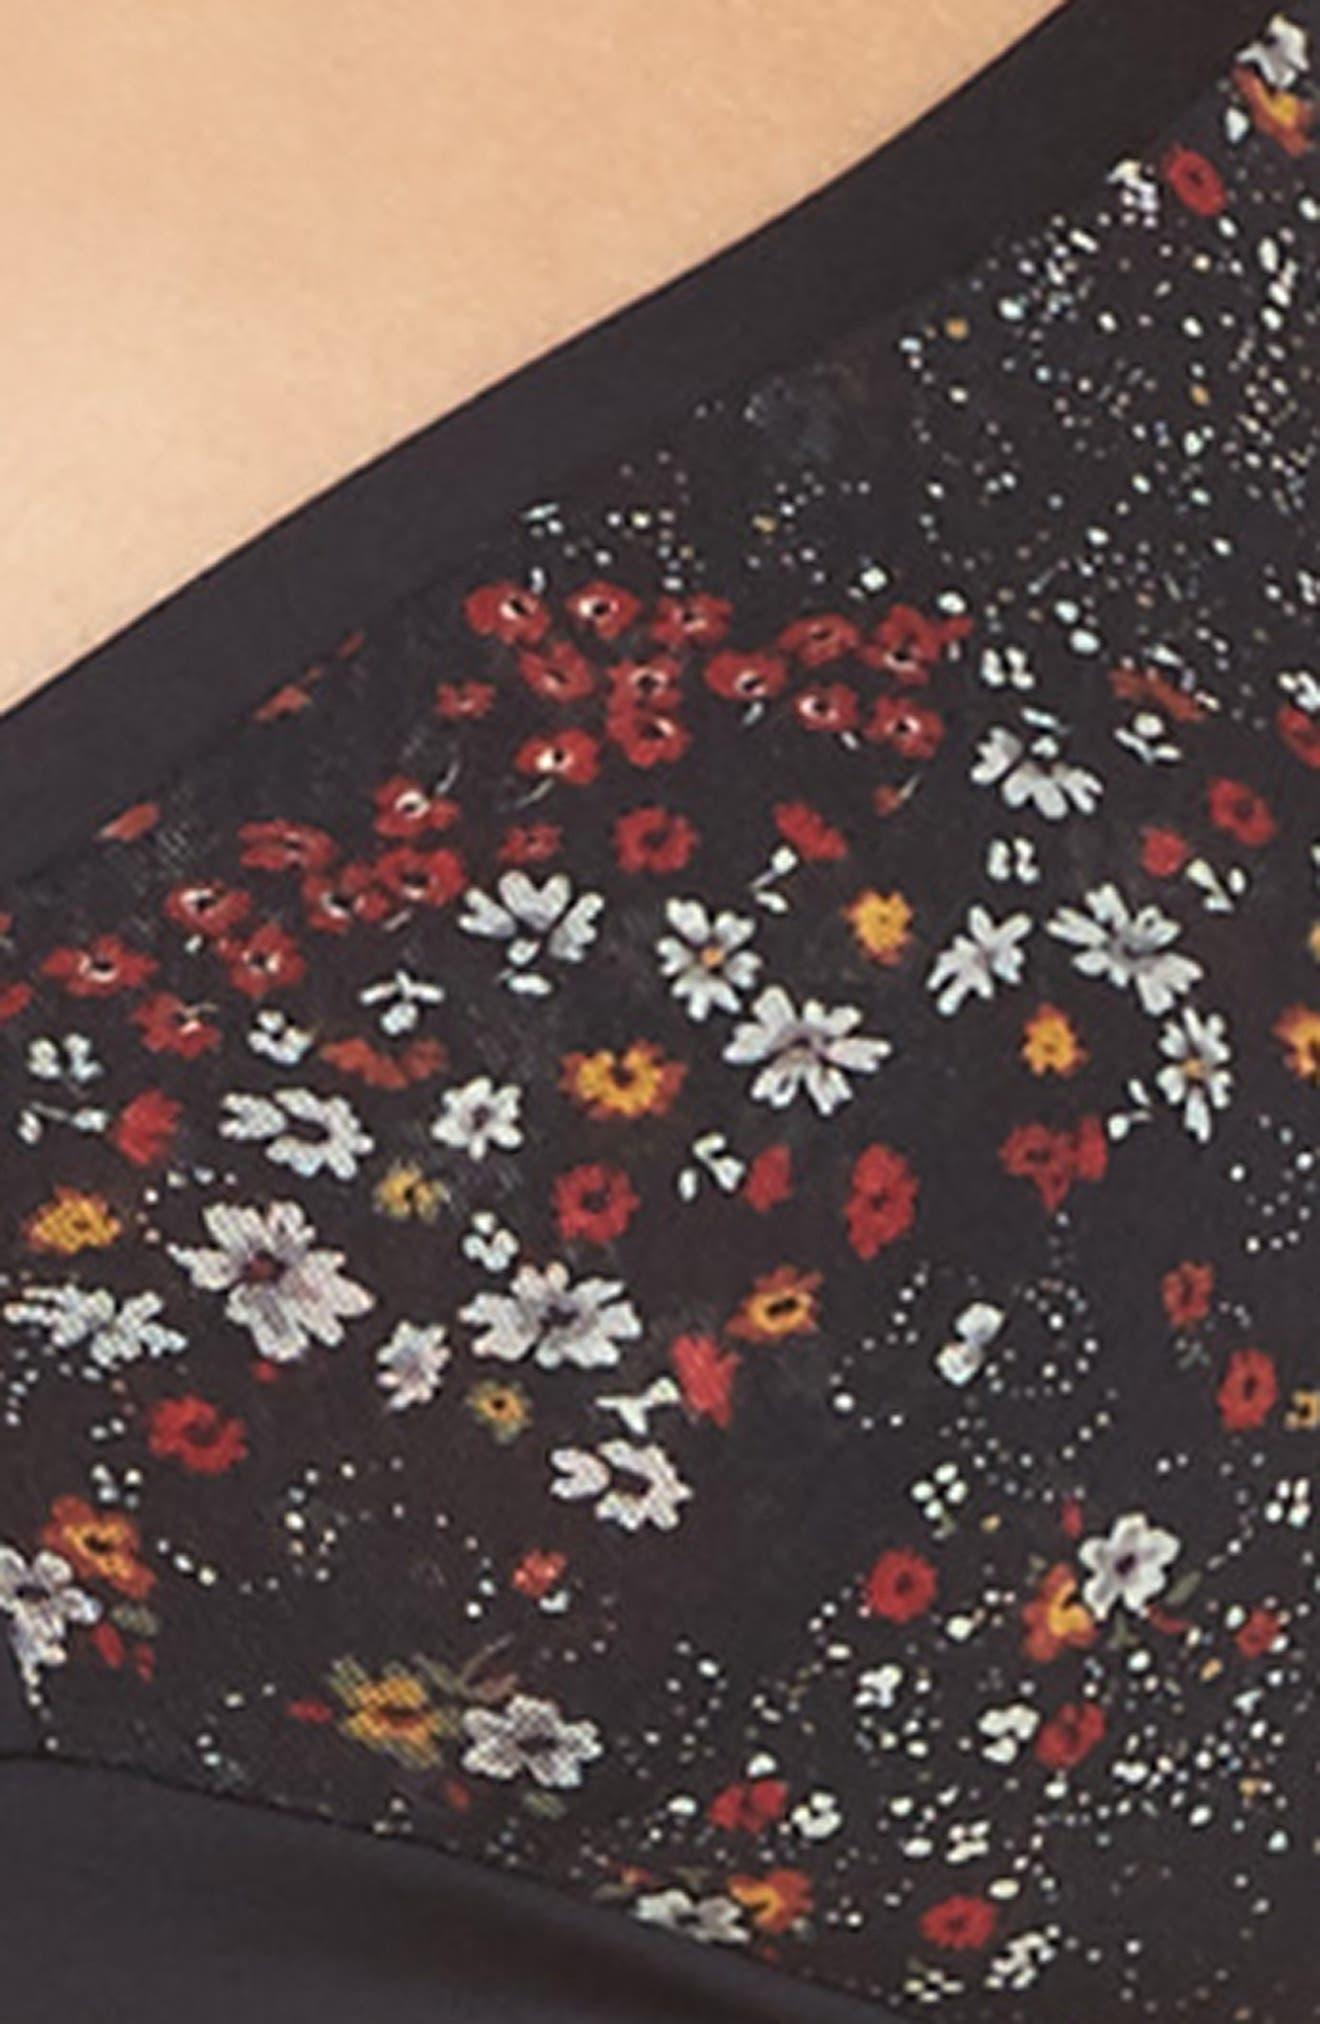 Verona Convertible Bralette,                             Alternate thumbnail 9, color,